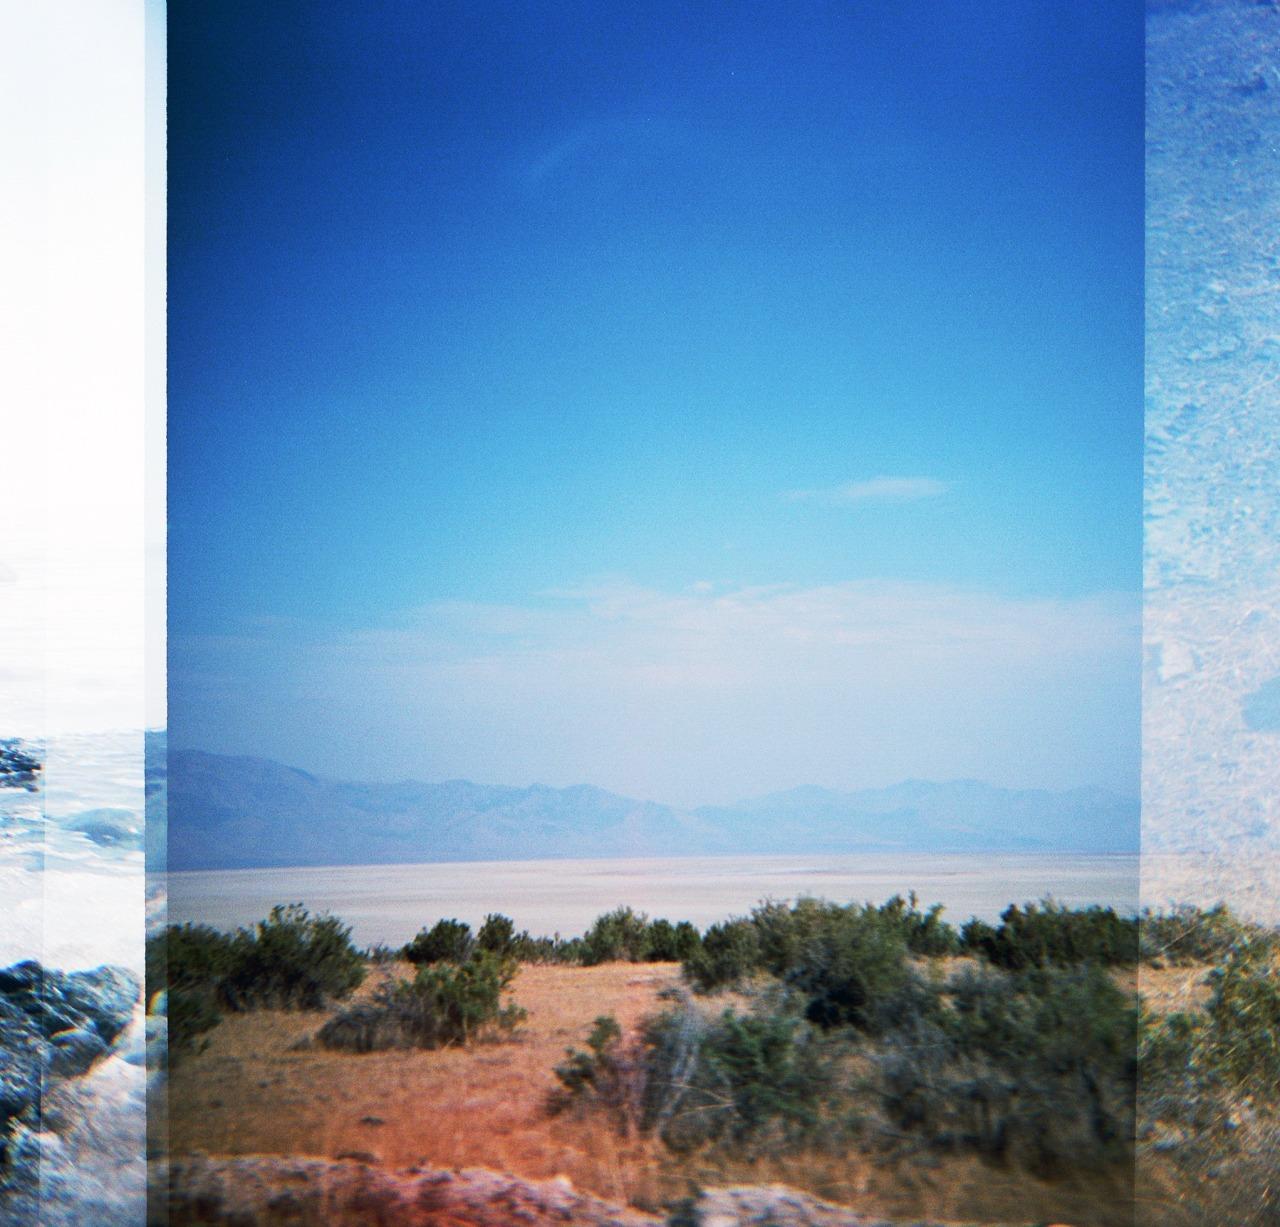 Water, Sky, Desert